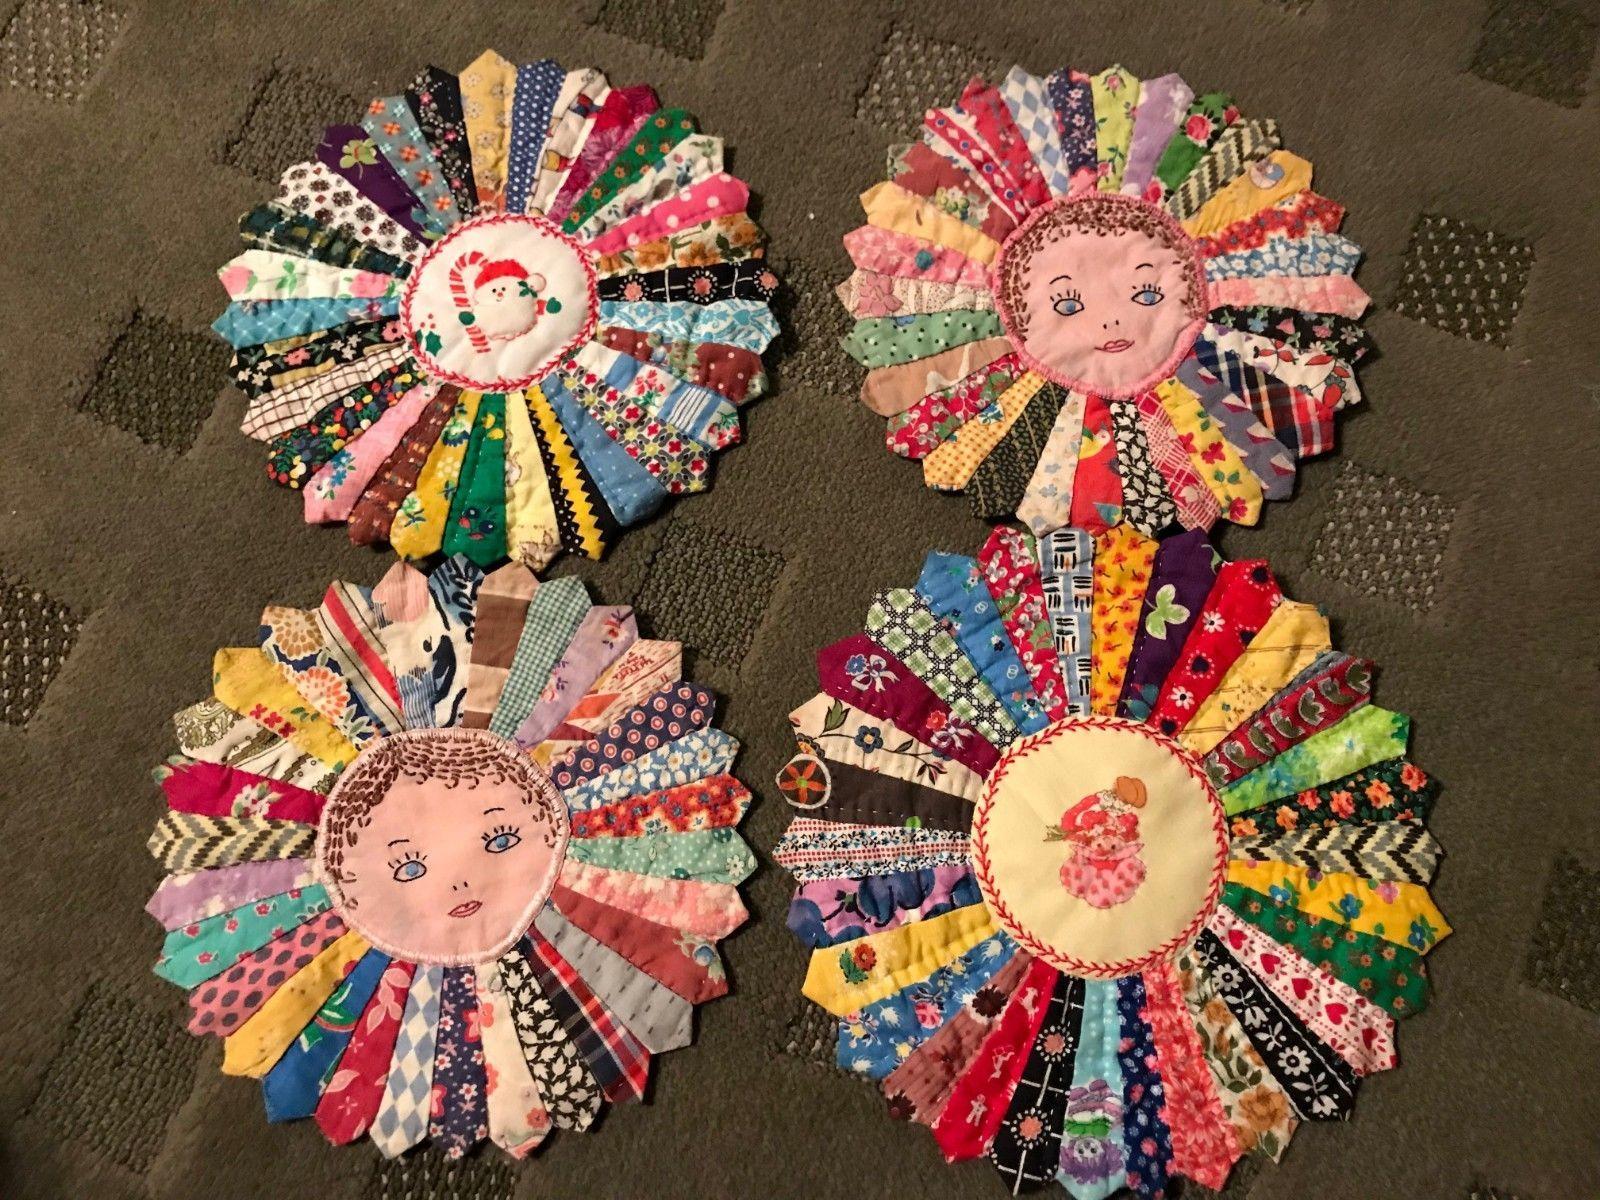 4 Vintage Hand Stitched Quilt Fan Potholders Pot Holders Hand